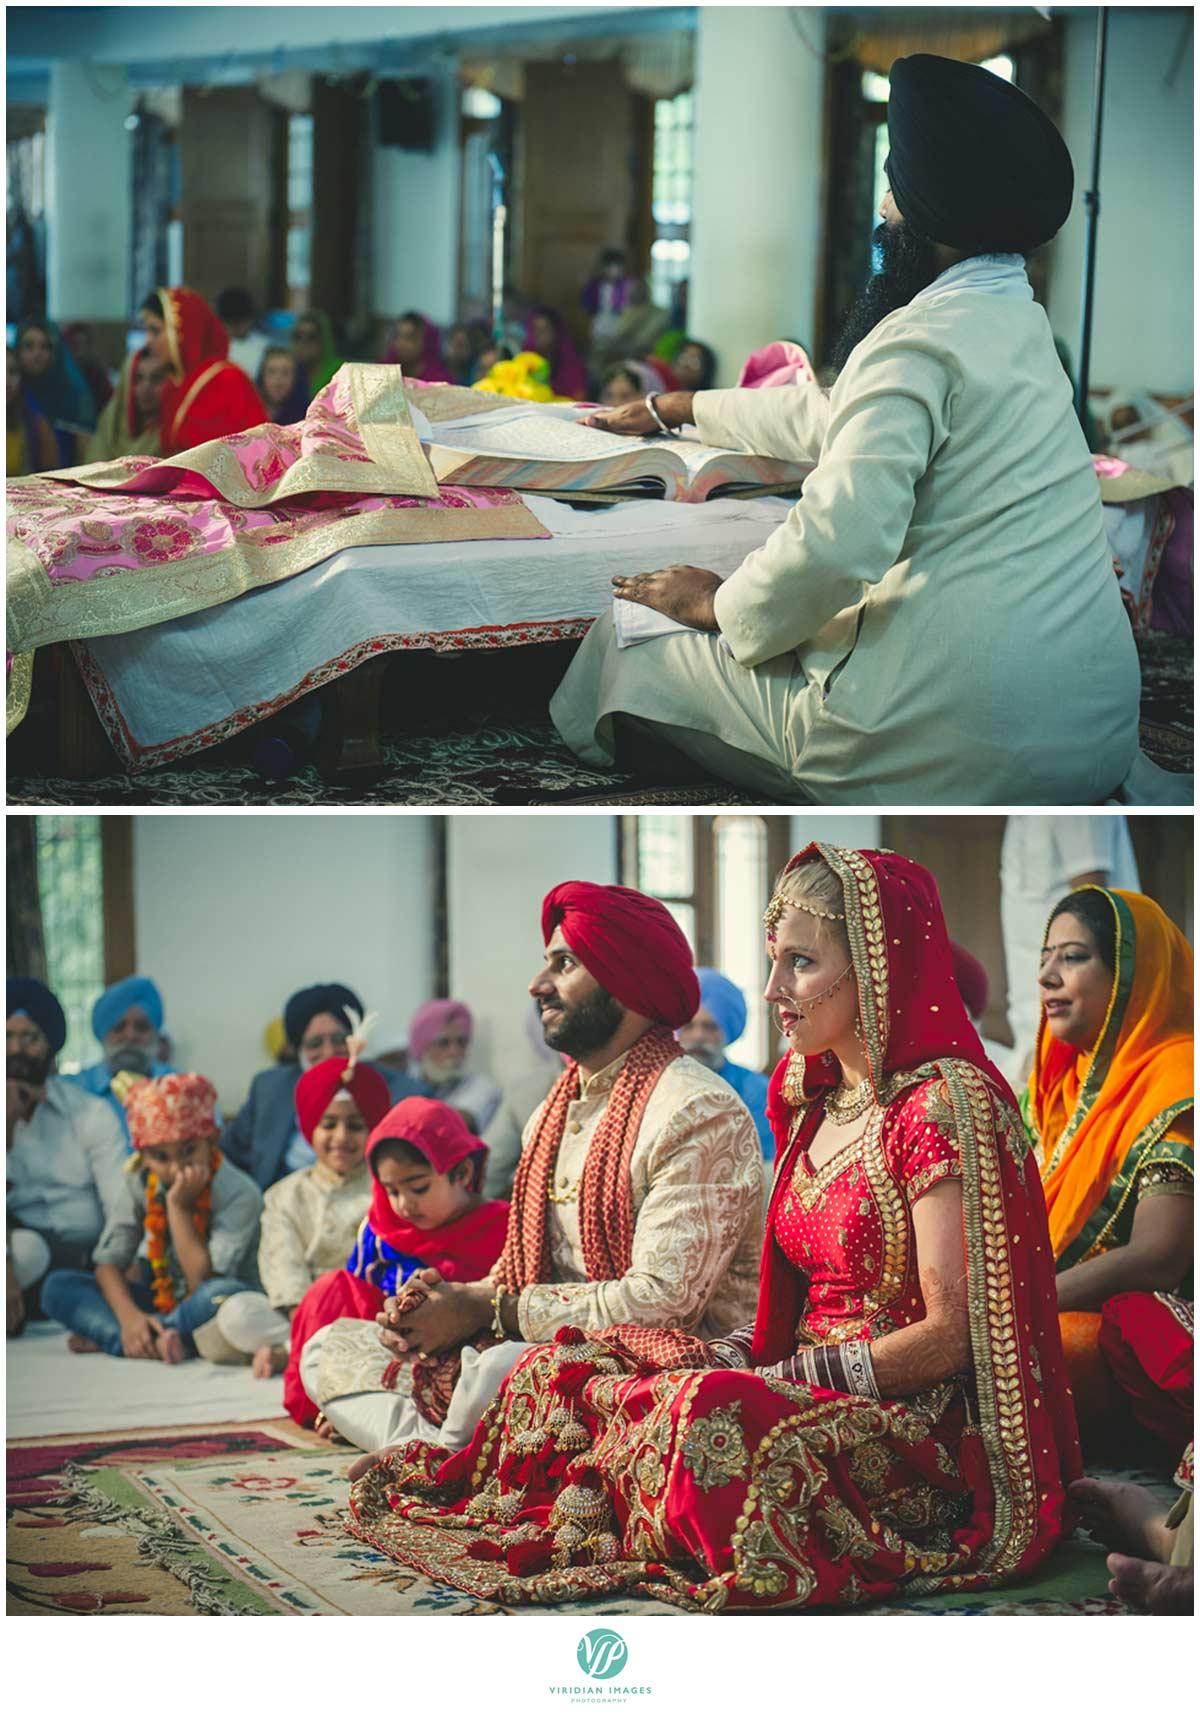 India_Chandigarh_Wedding_Viridian_Images_Photography_poto_24